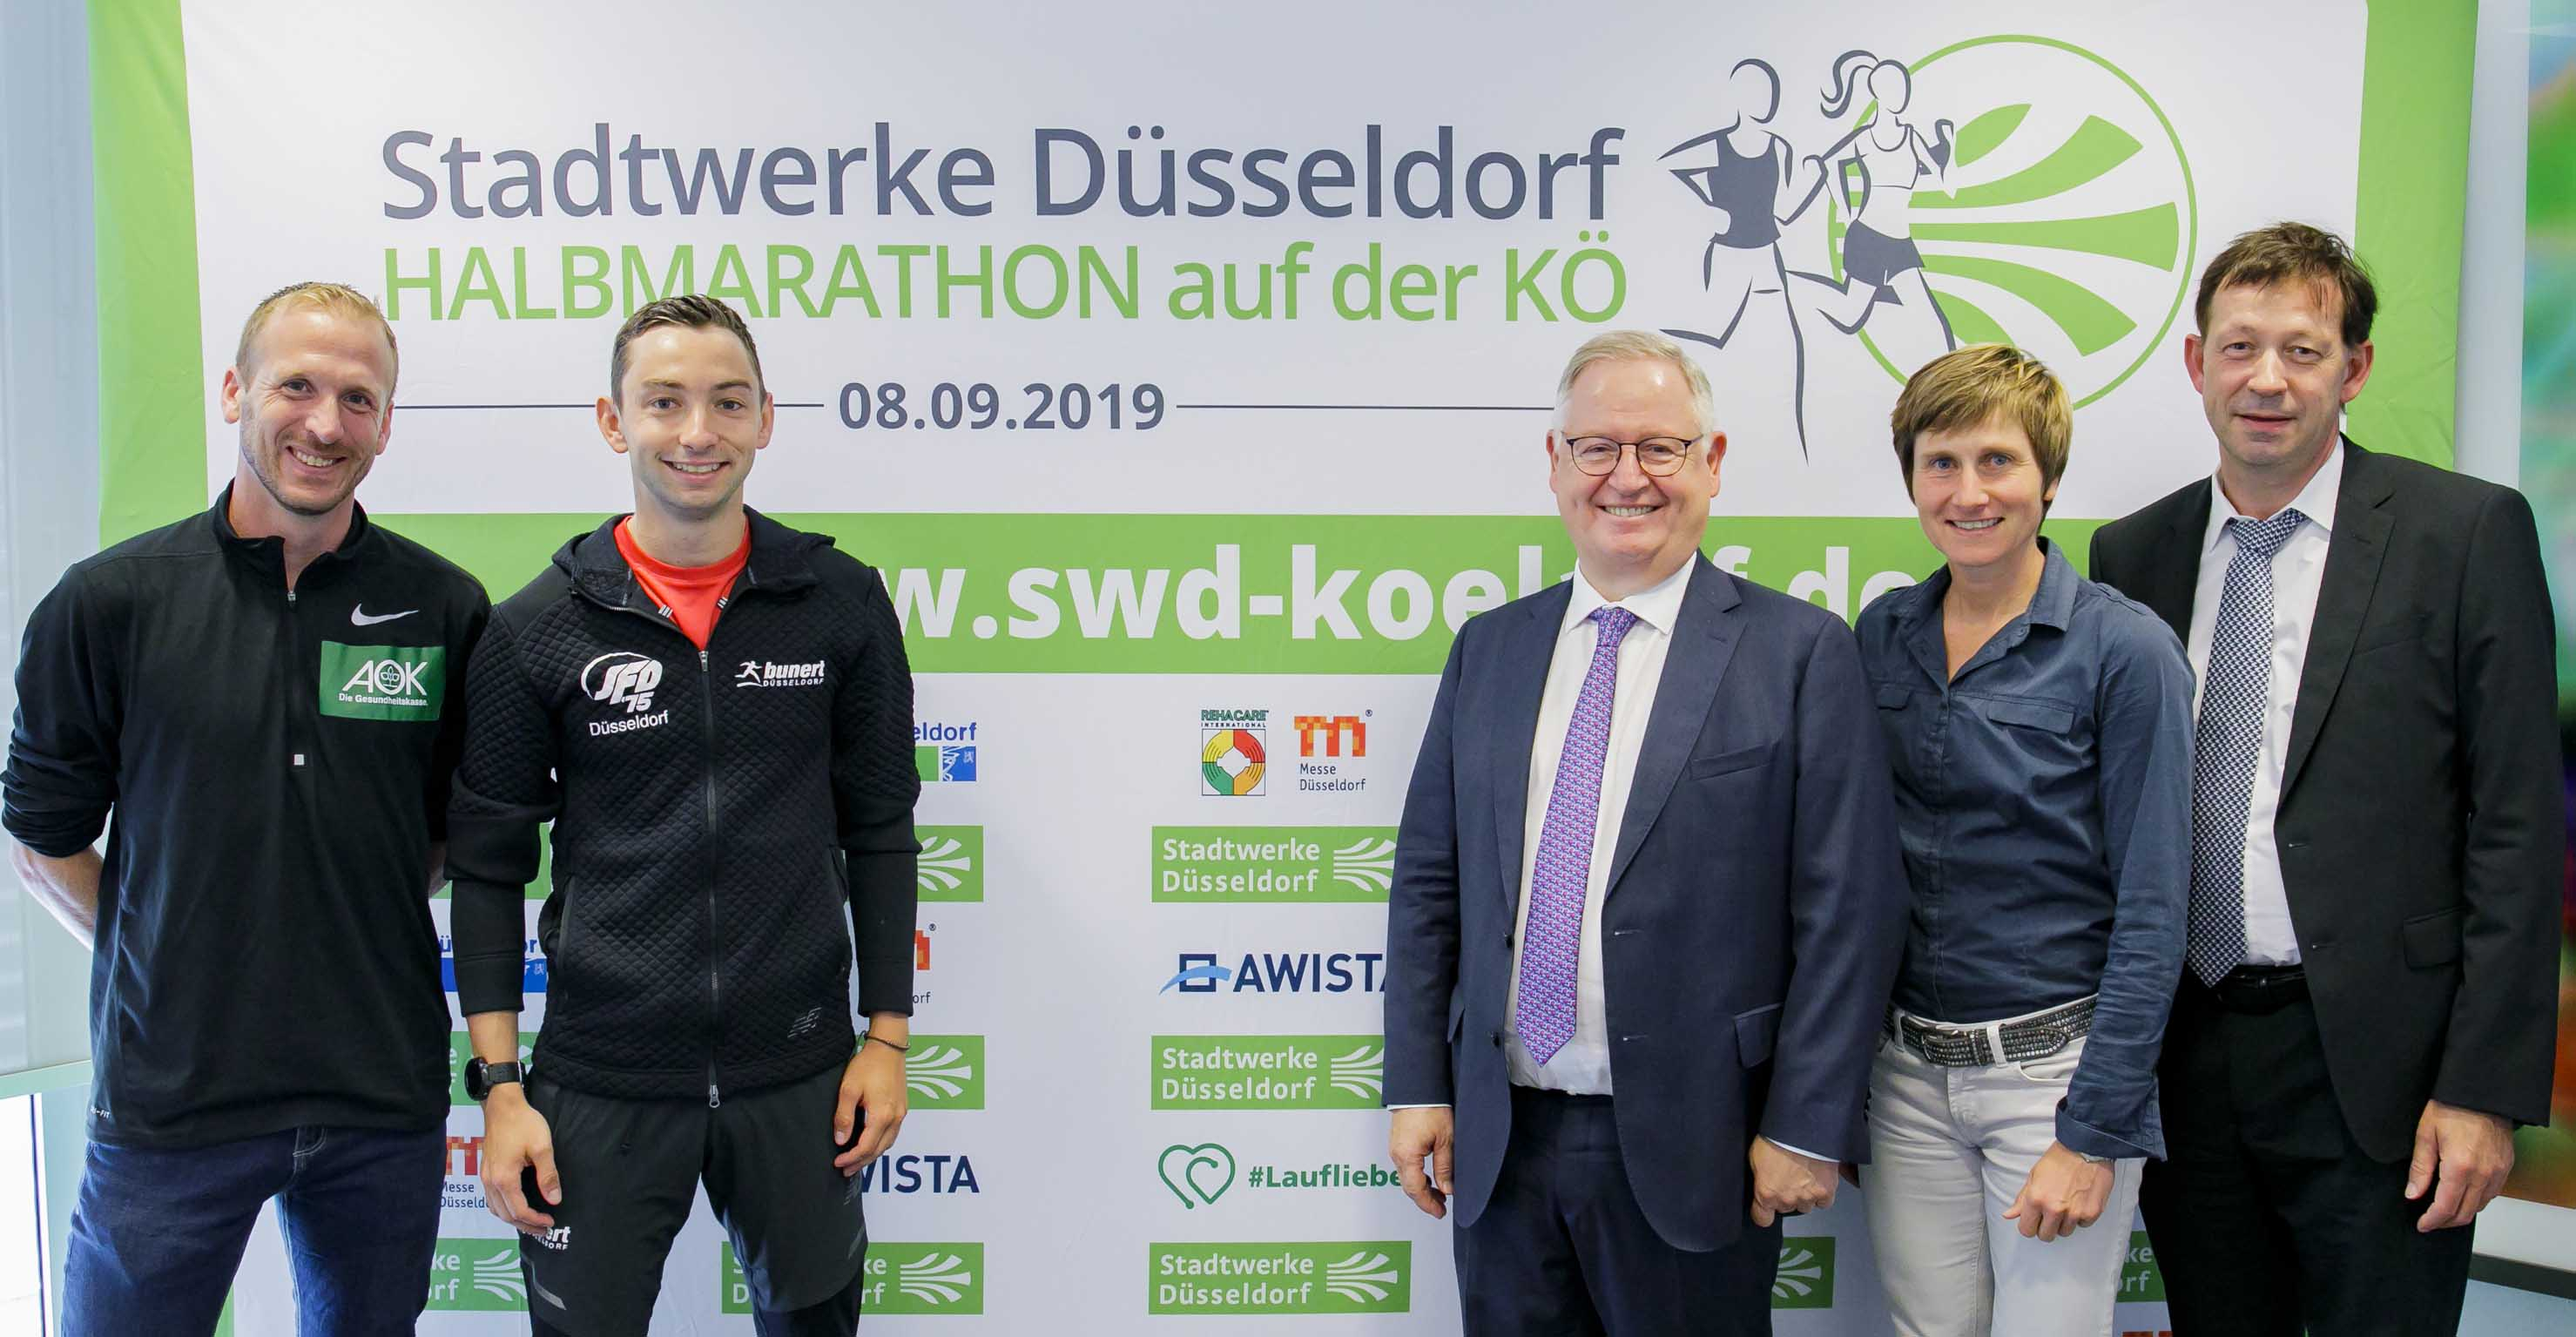 Jan Fitschen, Maximilian Thorwirth, Manfred Abrahams, Sonja Oberem und Burkhard Hintzsche (Foto: Stadtwerke Düsseldorf AG)